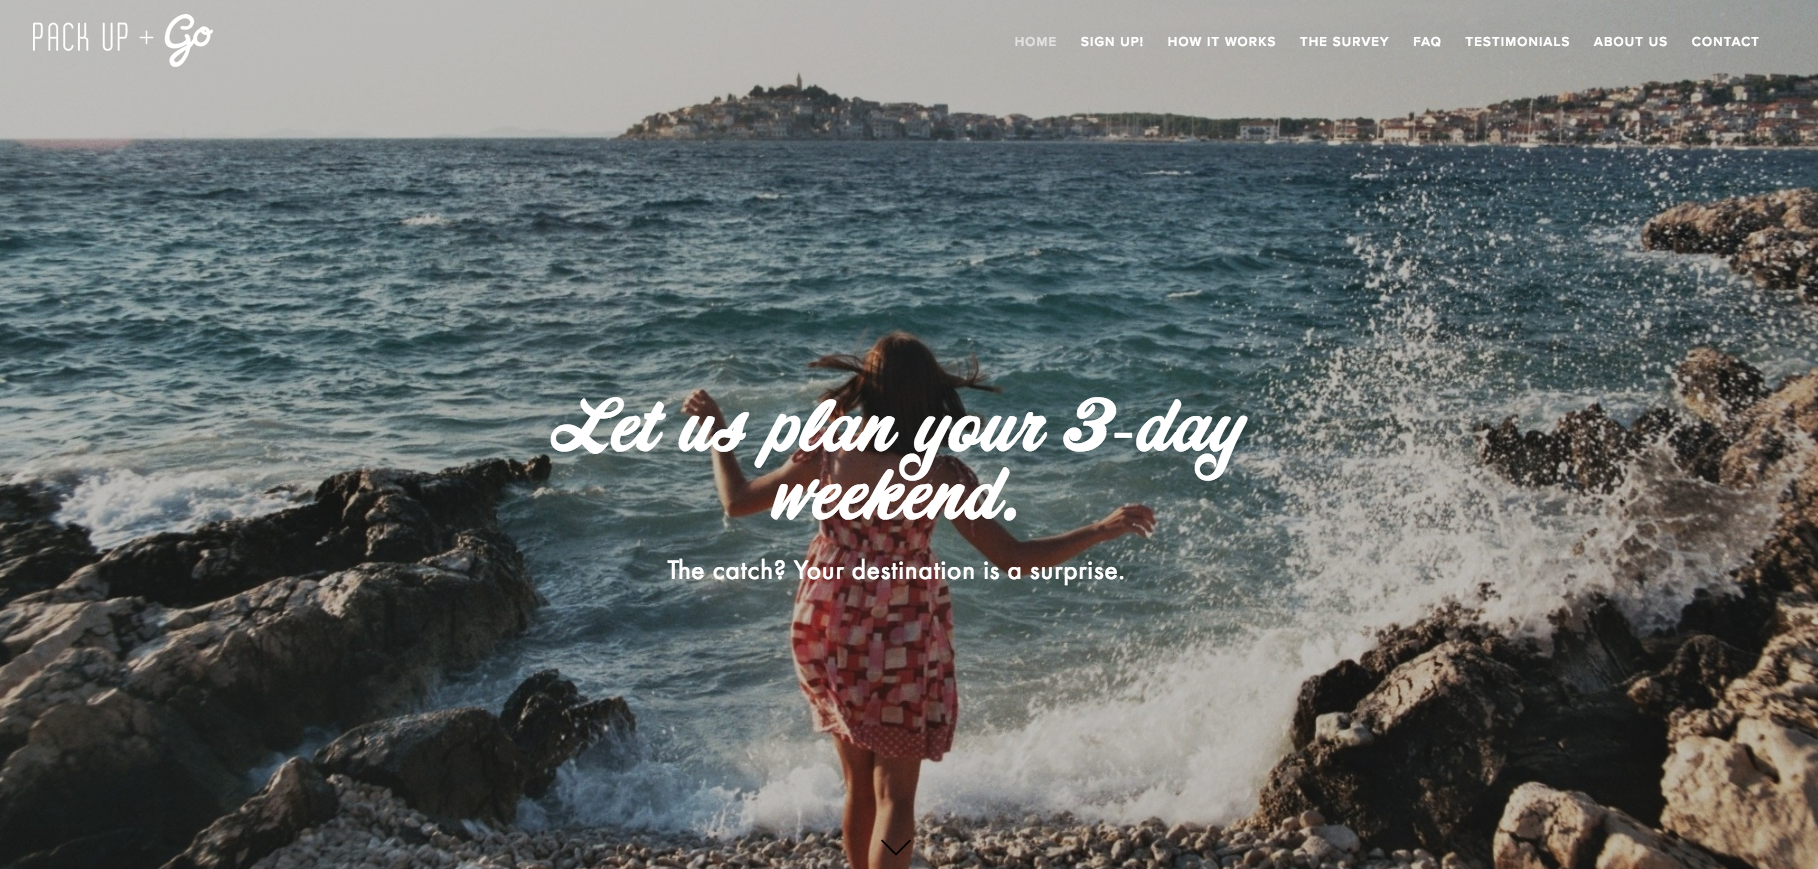 perierga.gr - Εταιρεία κανονίζει διακοπές χωρίς να αποκαλύψει τον προορισμό!